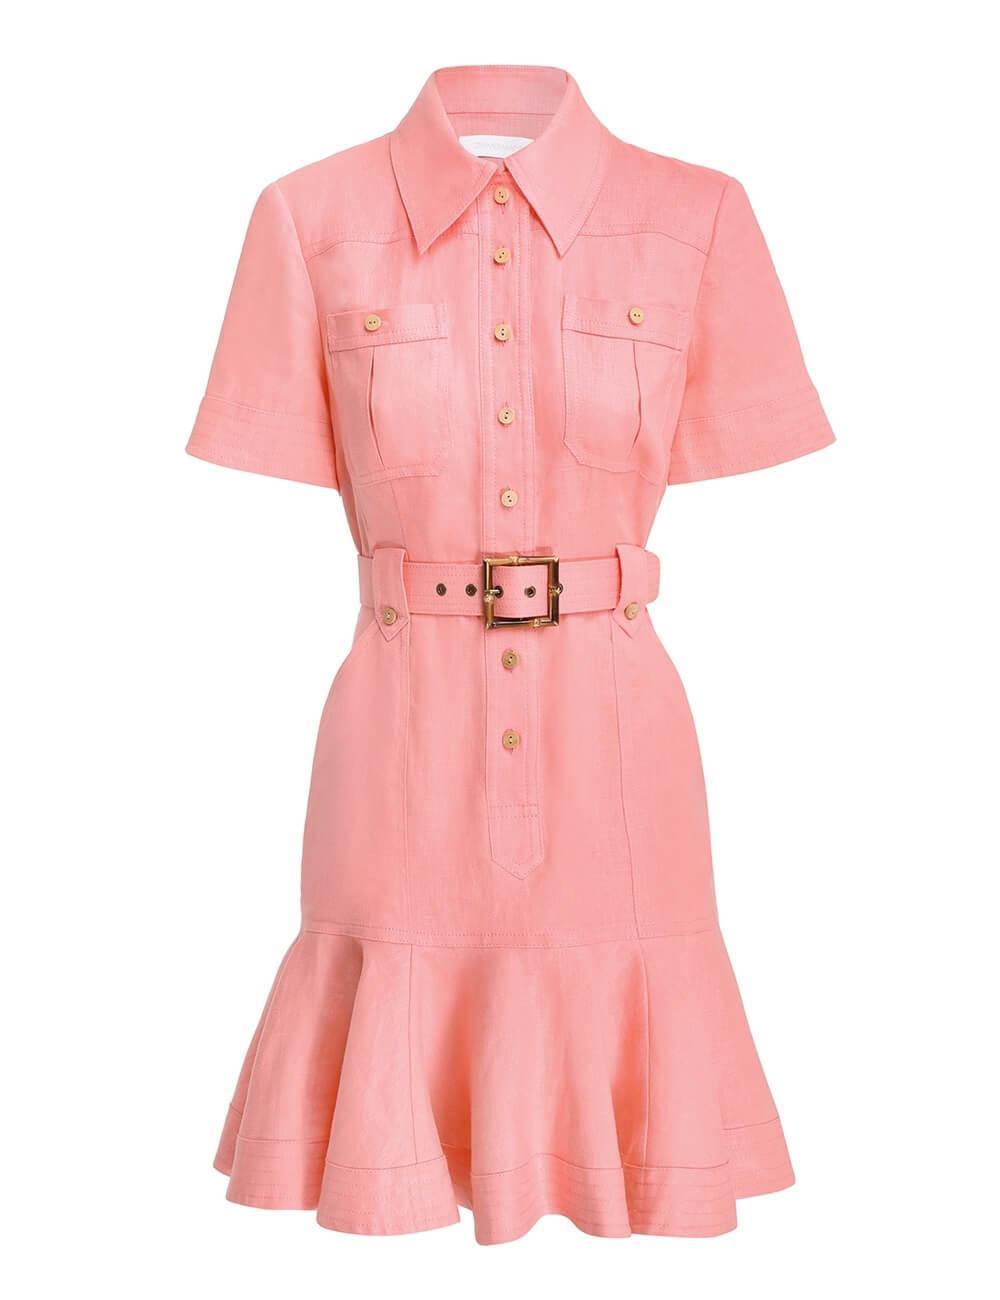 Poppy Belted Mini Dress Item # 9369DPOP-W